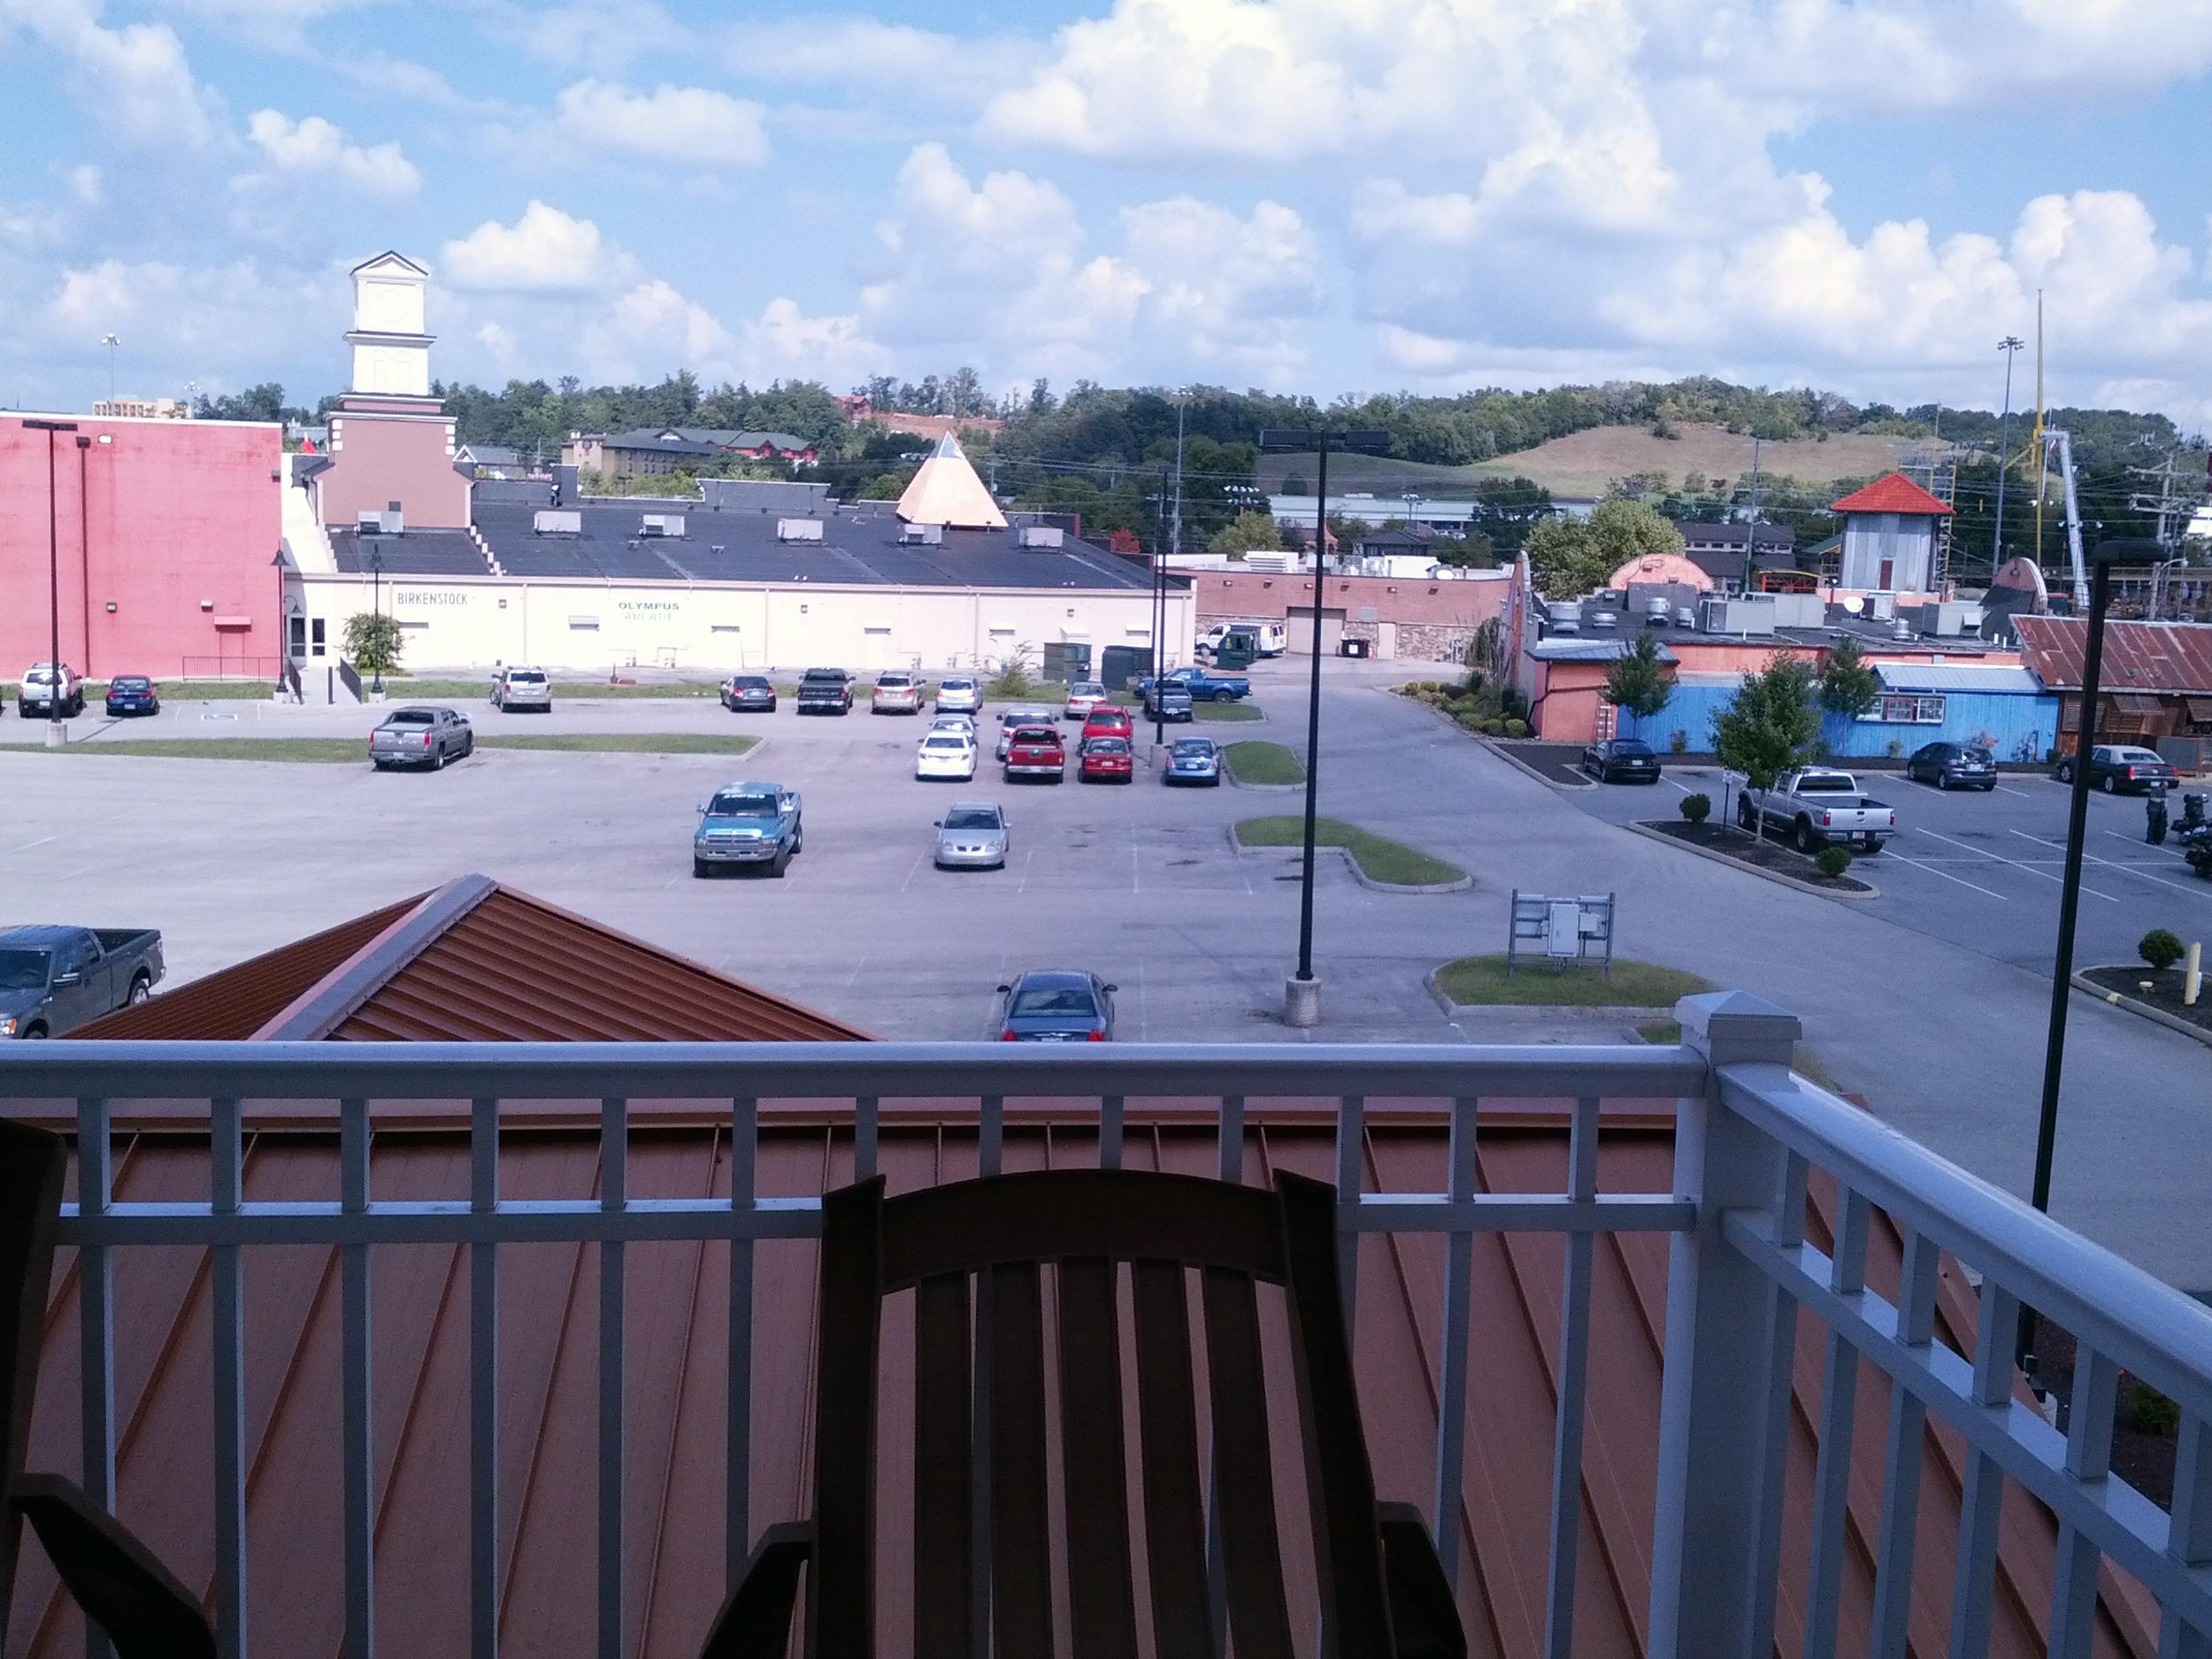 2013-09-26 Clarion Inn, Pigeon Forge TN (8)